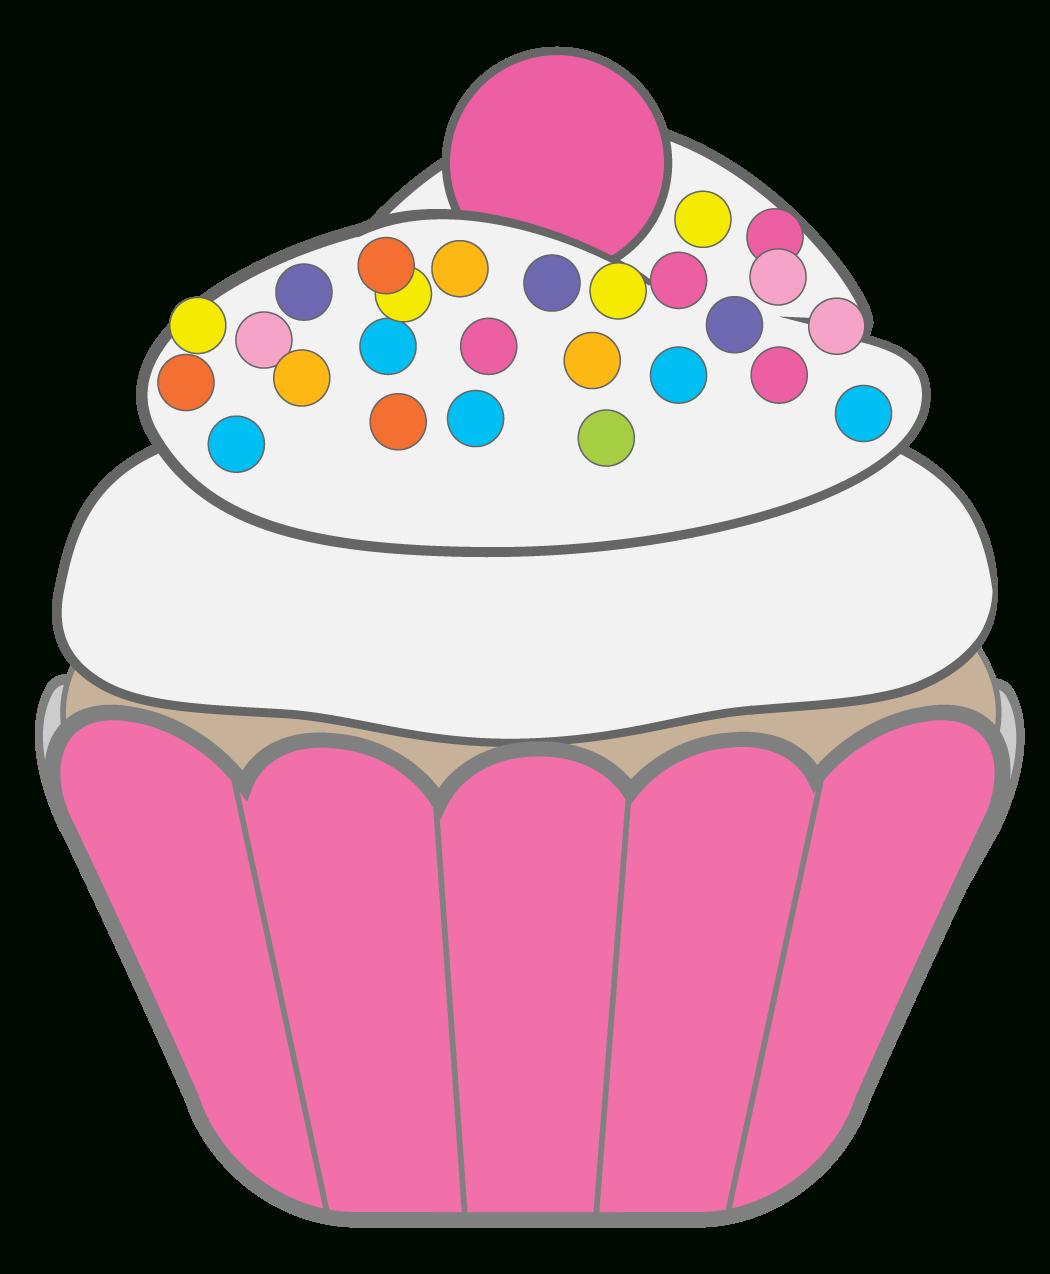 Cupcakes / Muffins | Cupcakes | Birthday Cake Clip Art, Cupcake - Free Printable Cupcake Clipart